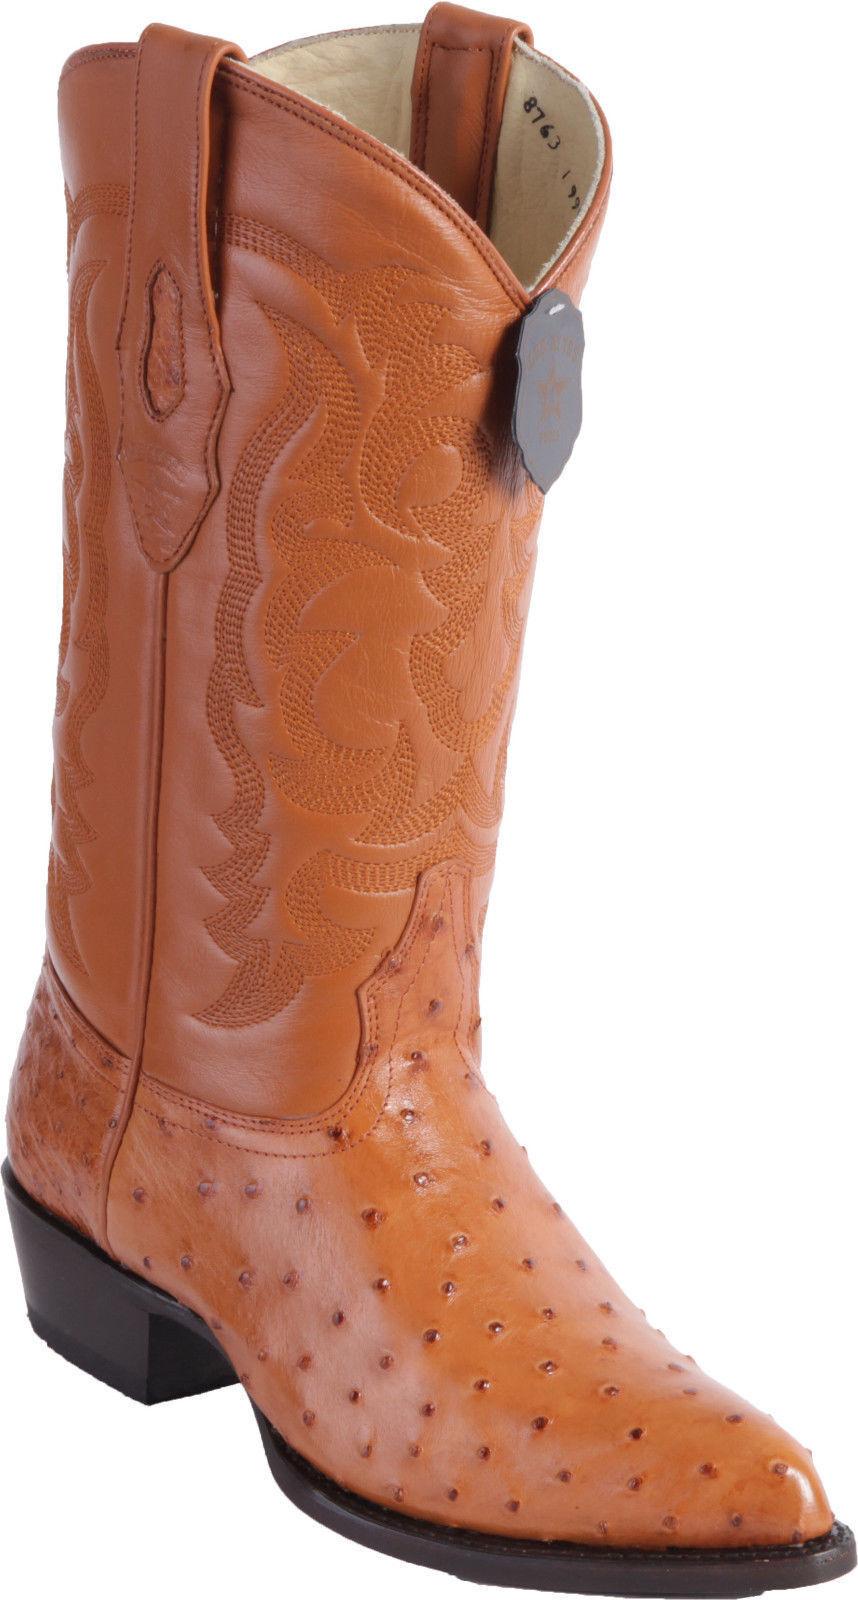 LOS ALTOS Uomo HONEY GENUINE FULL QUILL OSTRICH WESTERN COWBOY BOOT J-TOE D